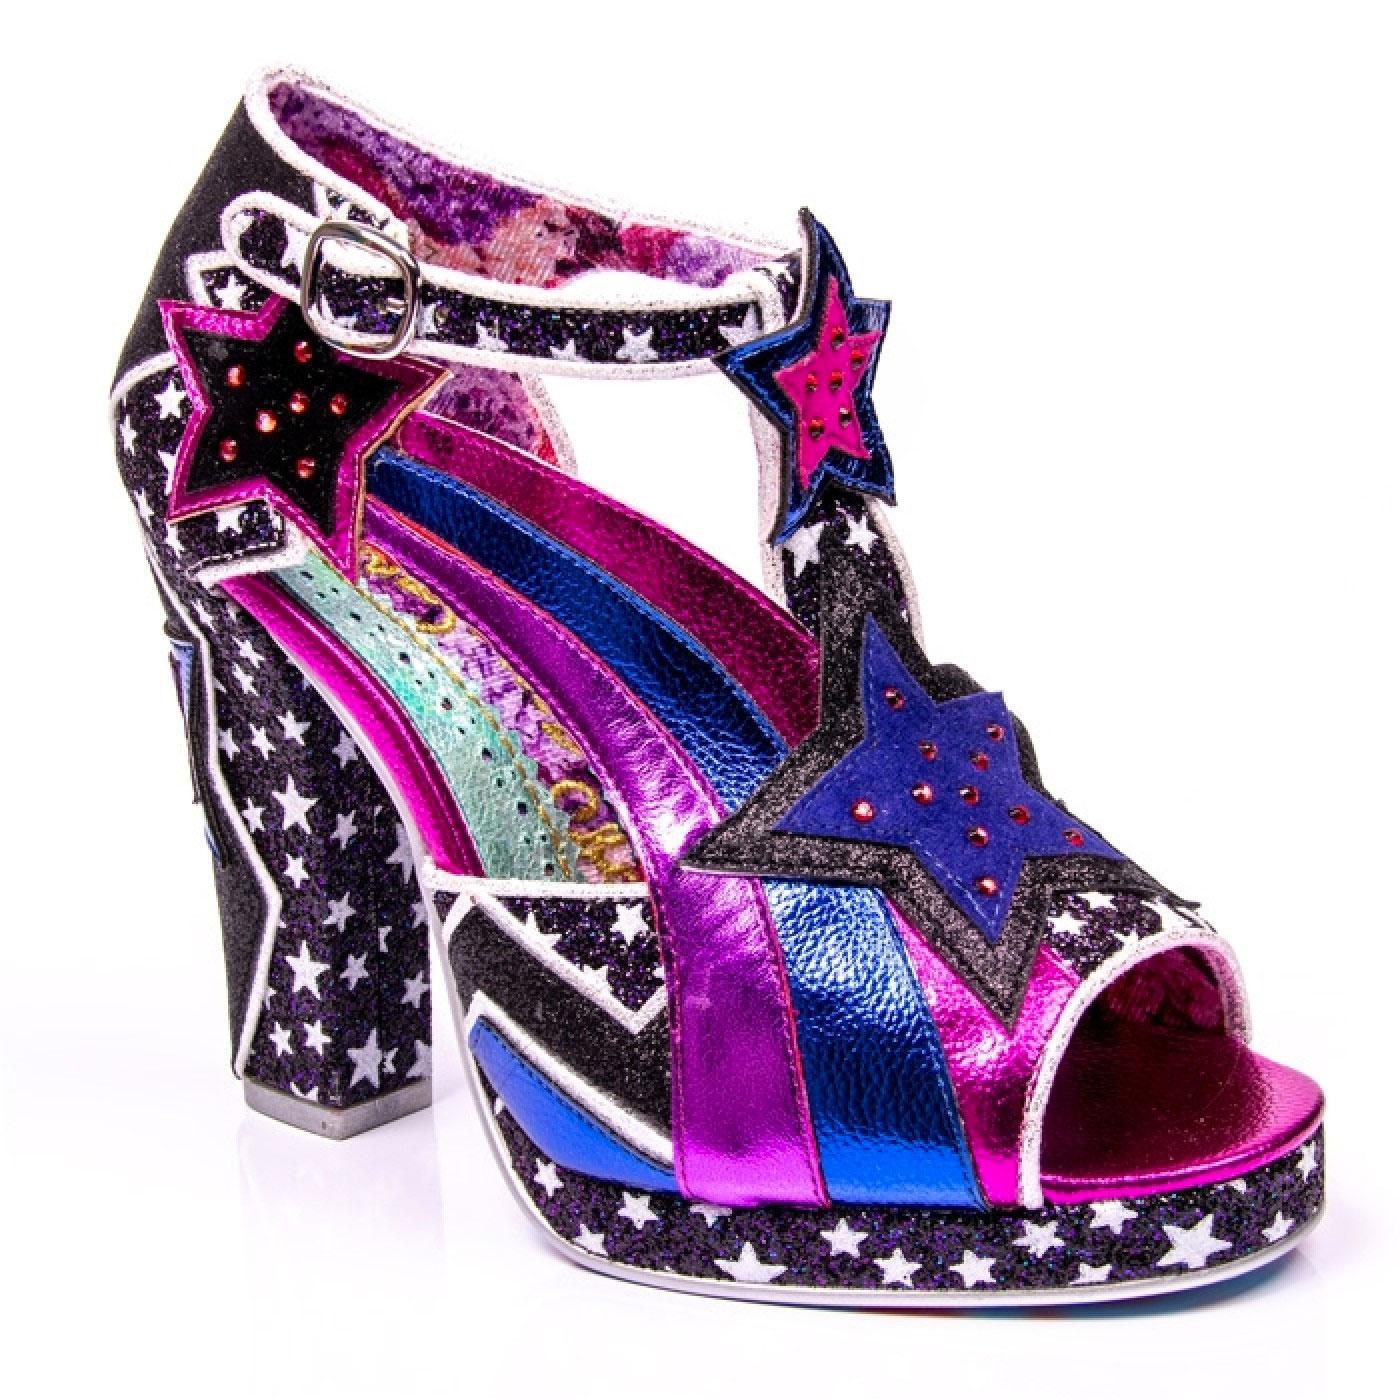 Eres Hermosa IRREGULAR CHOICE Retro 70s Glam Shoes